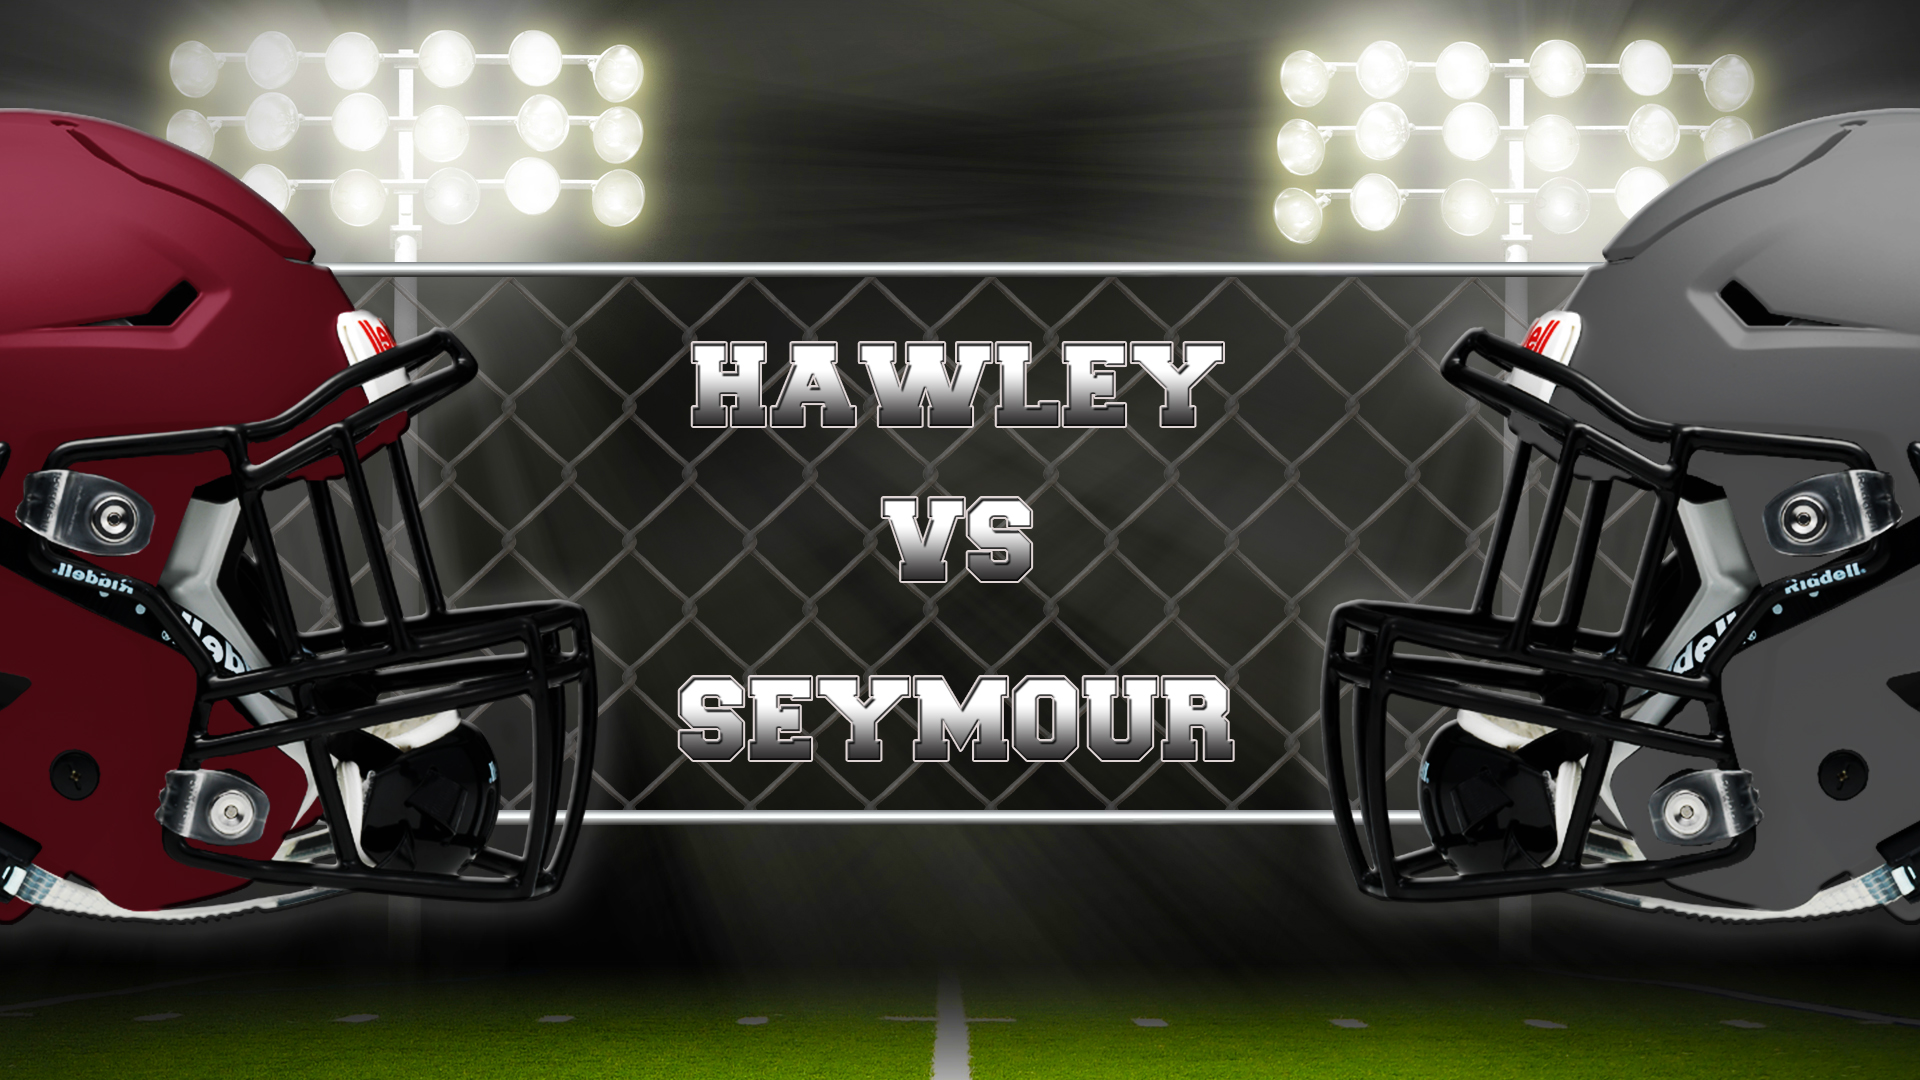 Hawley vs Seymour_1475157623208.jpg